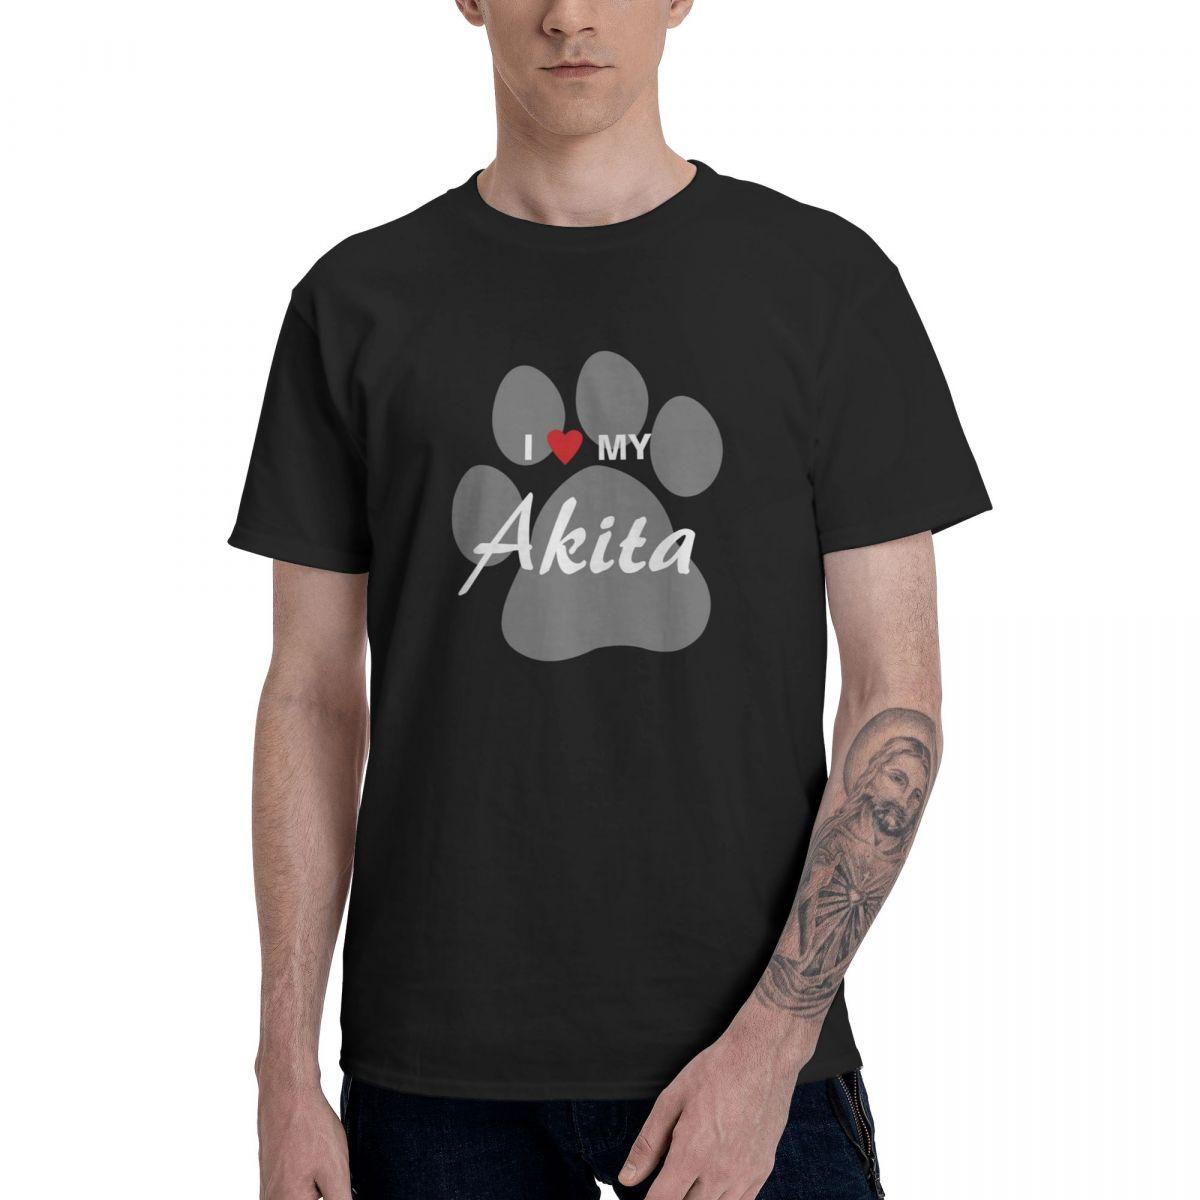 I Love (Heart) My Akita Paw Print Graphic Tee Men's Basic Short Sleeve T-Shirt Funny Tops kids sequins heart graphic tee